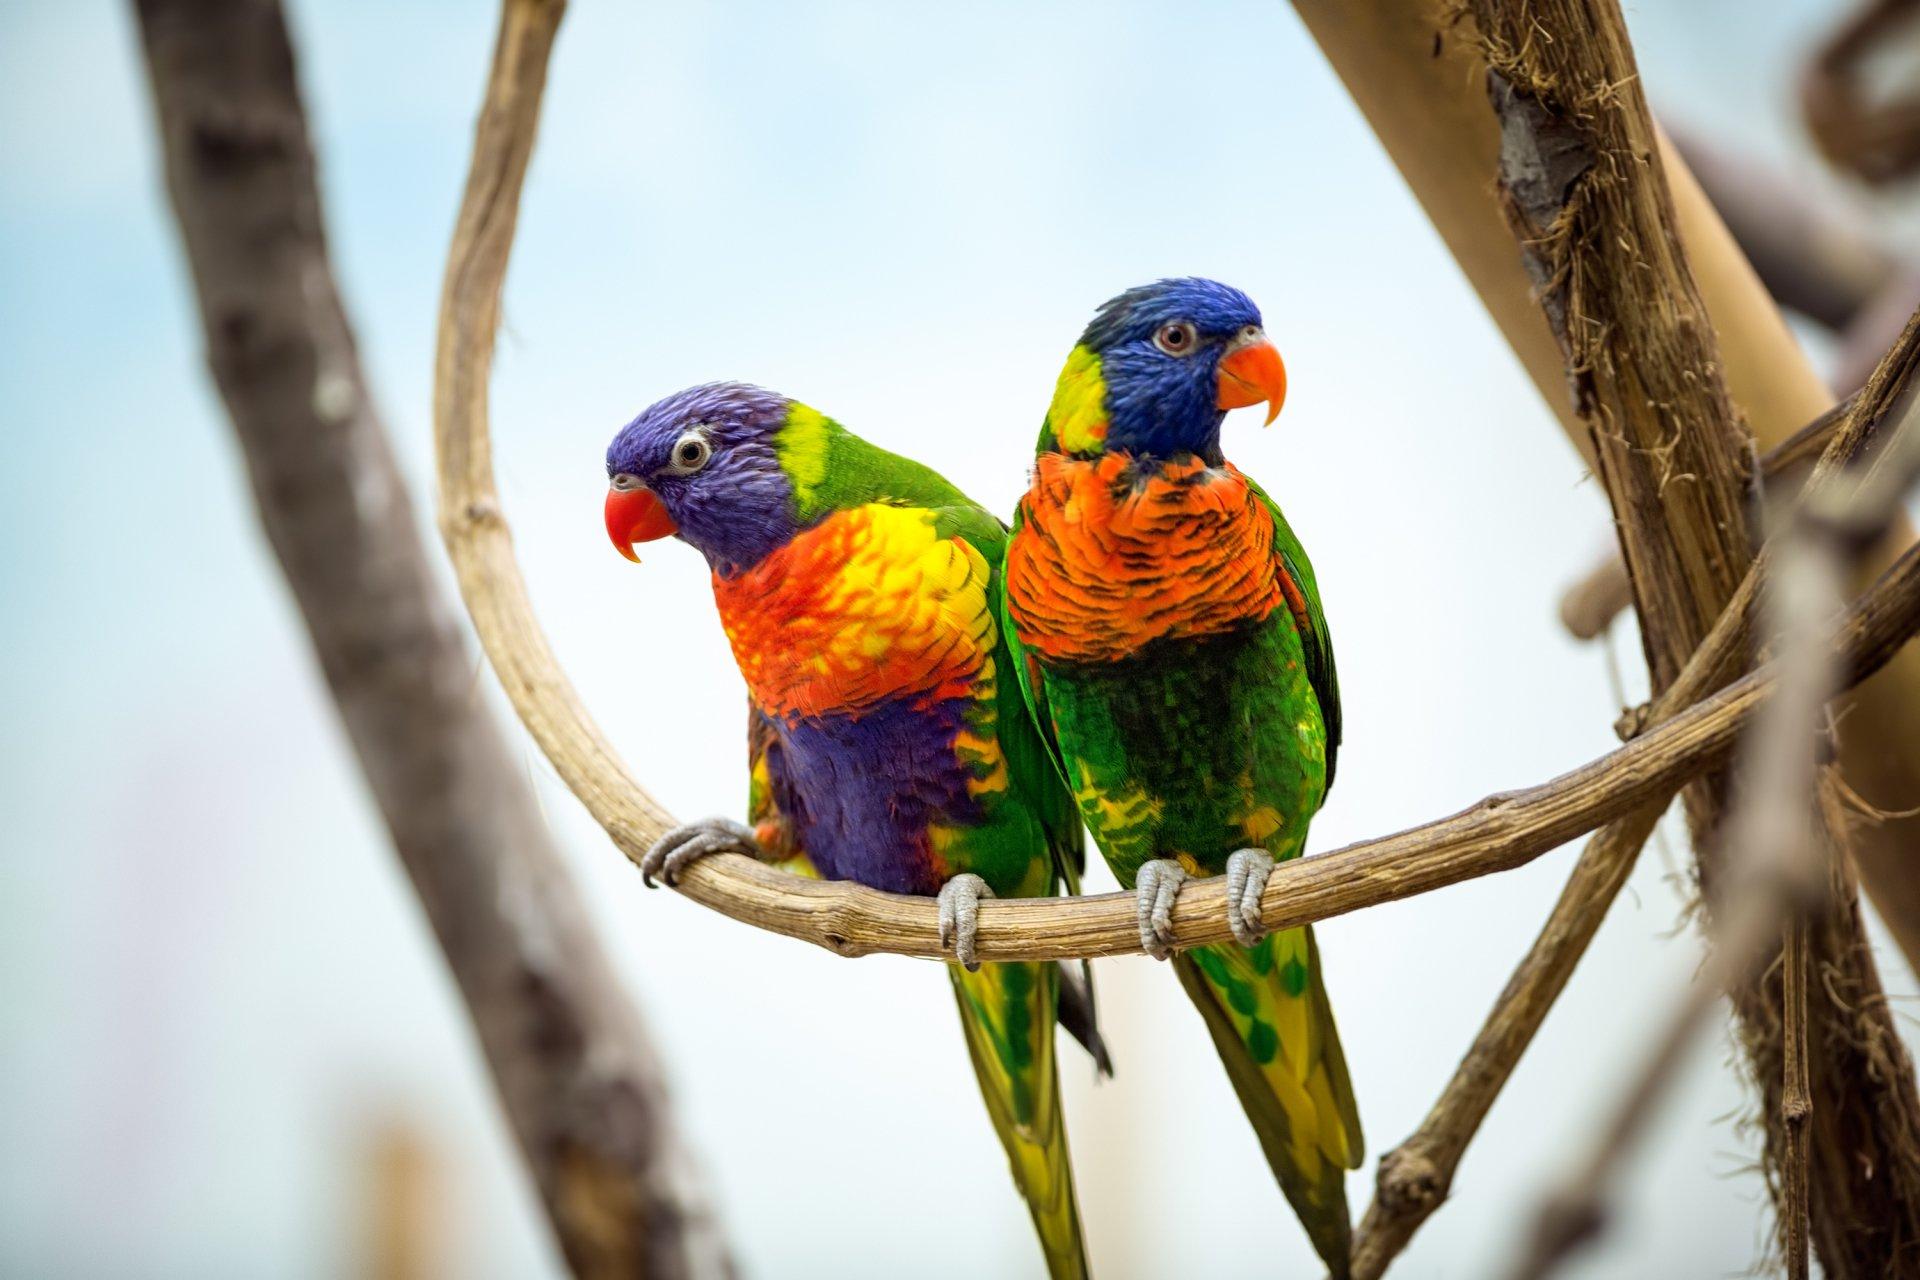 A Beautiful Couple Of Lorikeet Birds Wallpaper Hd: Rainbow Lorikeet Full HD Wallpaper And Background Image